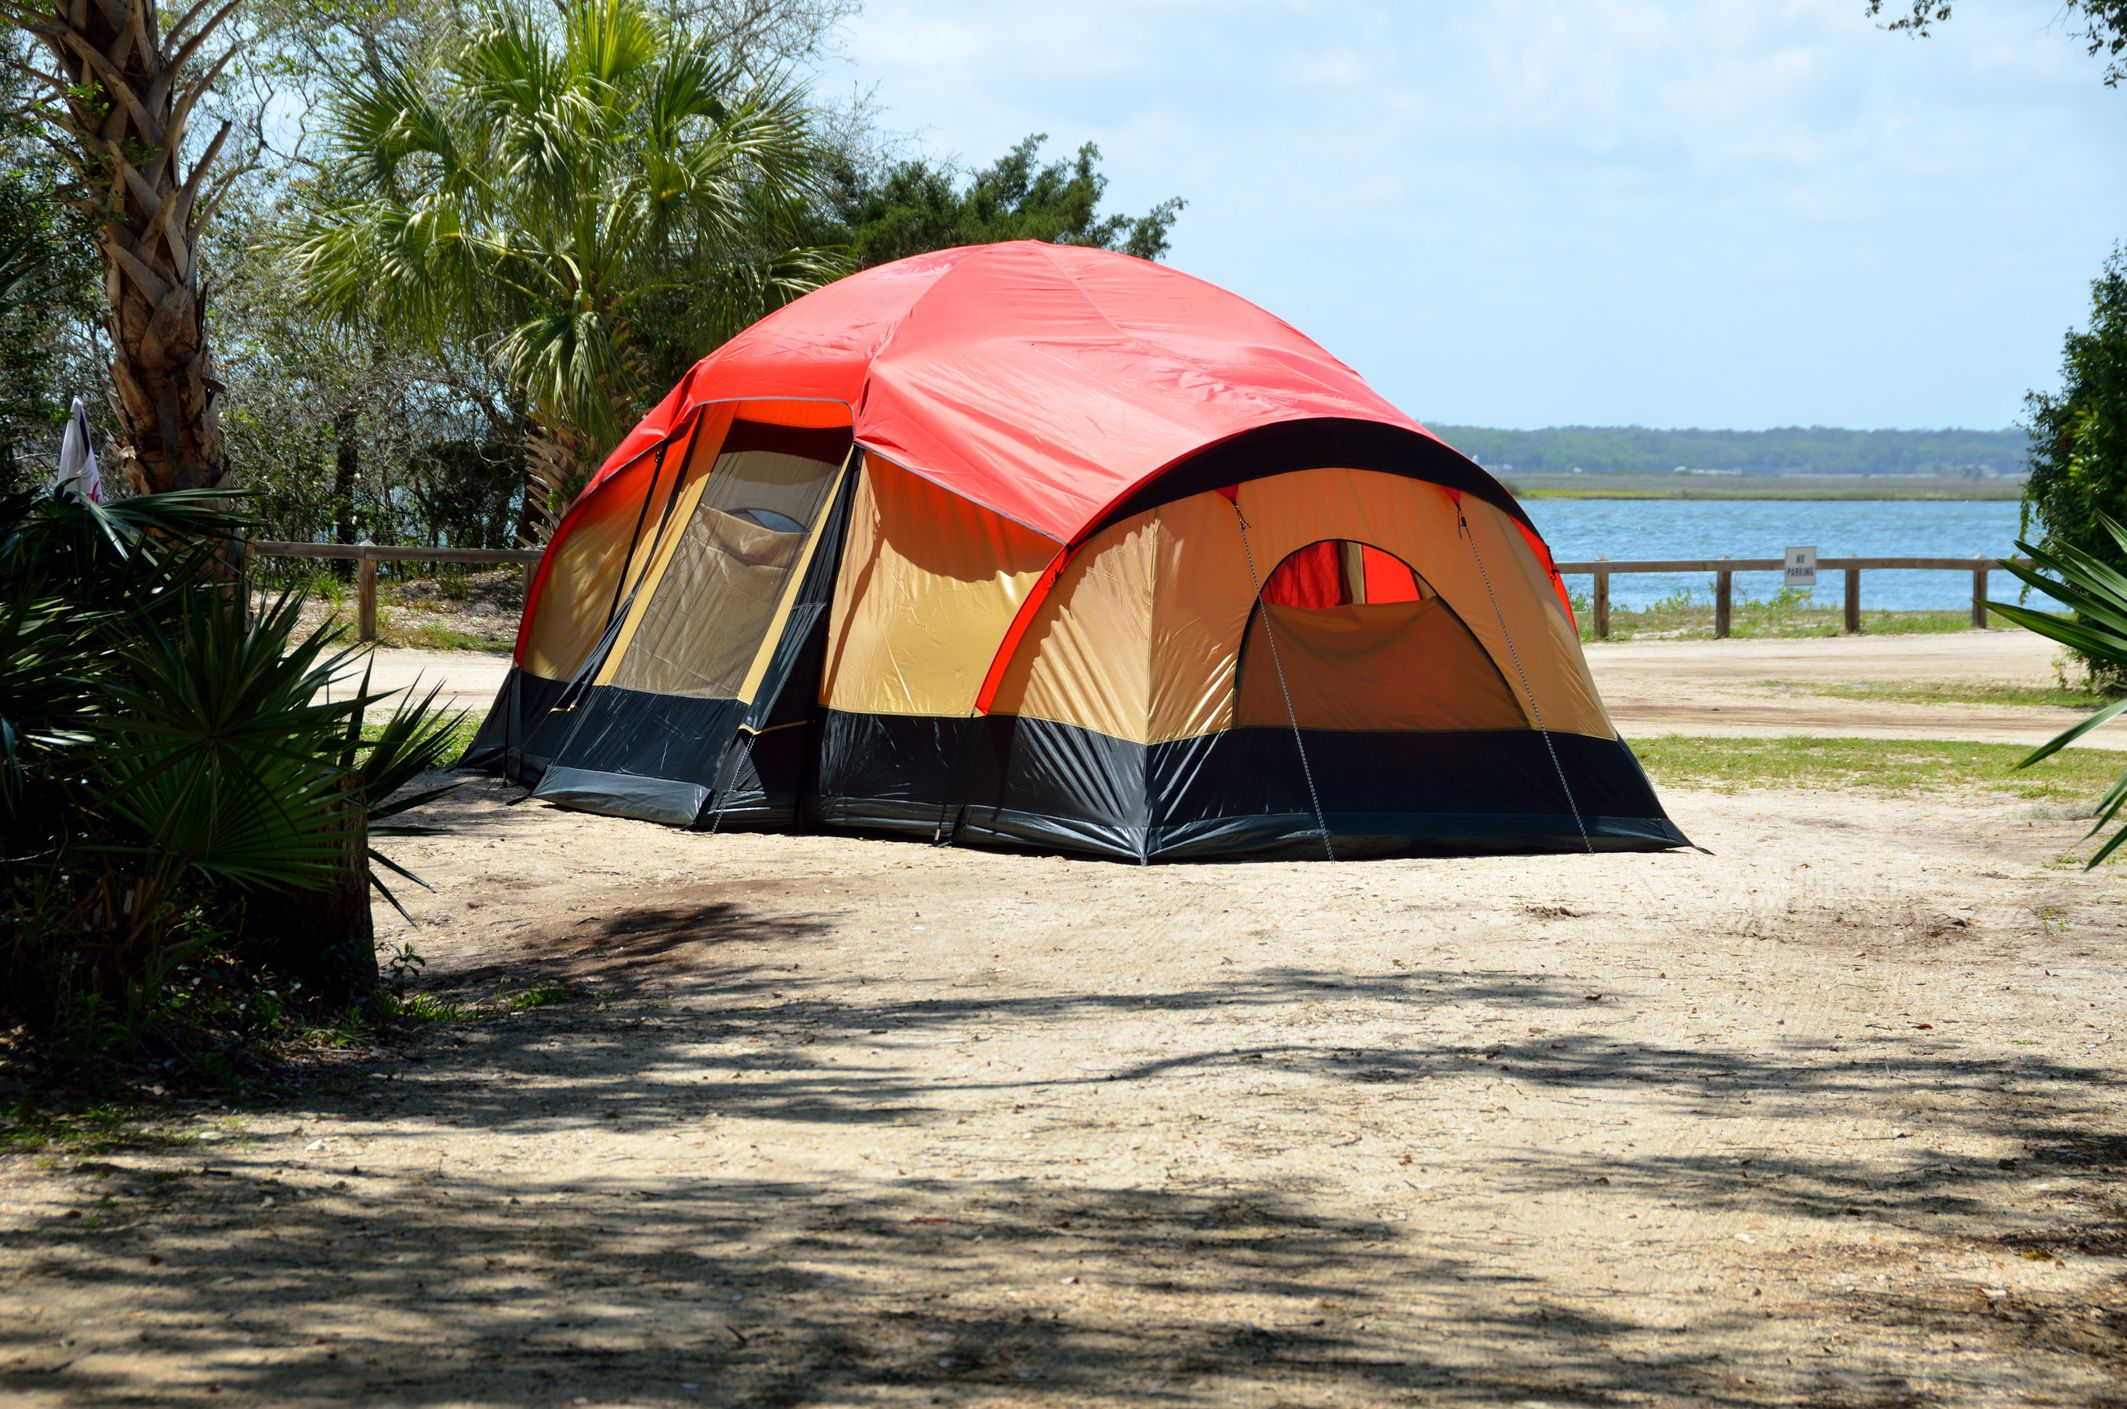 Surviving Summer Camping in Florida